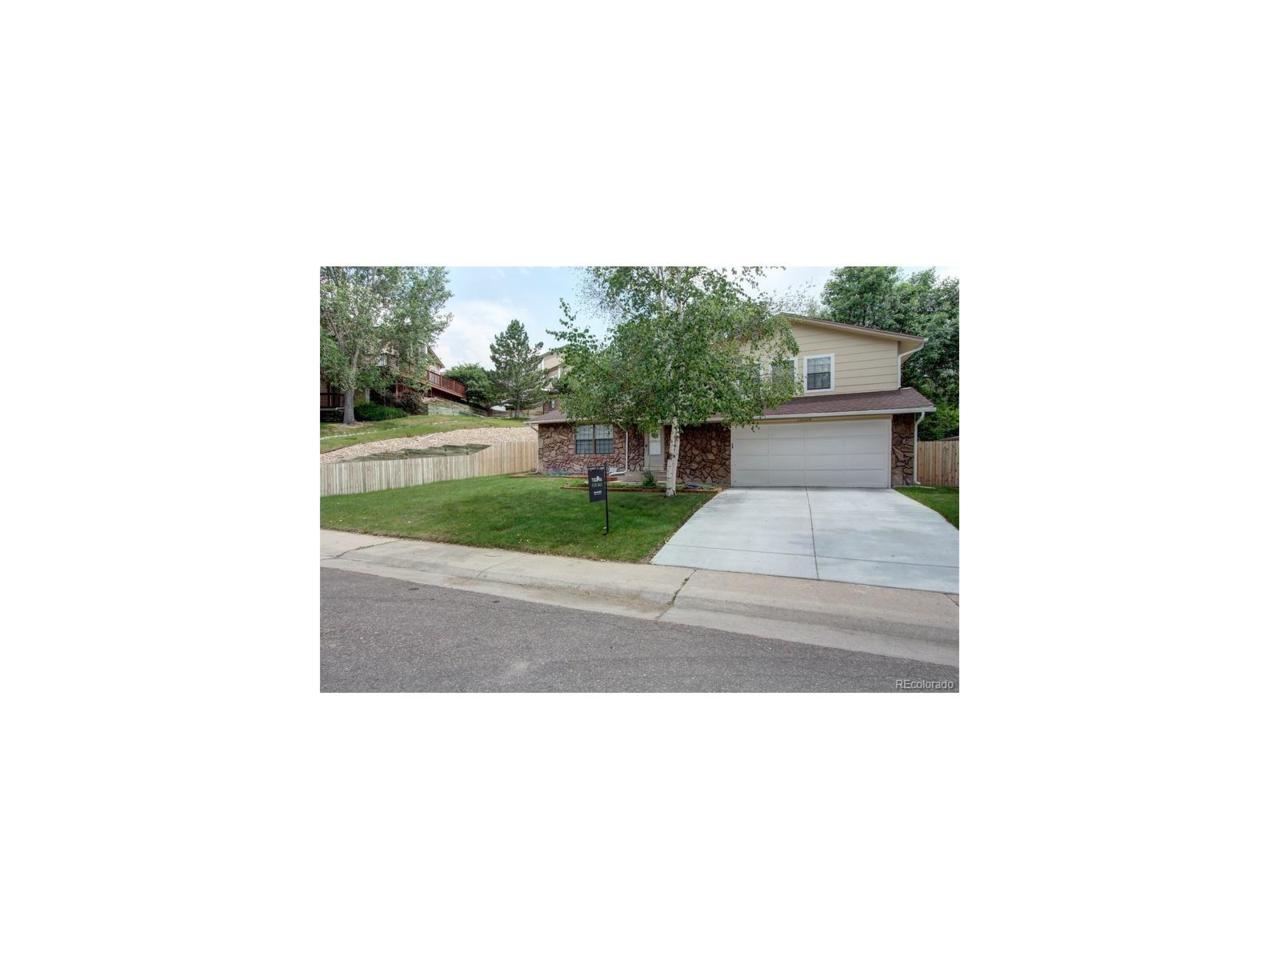 7604 W Ontario Place, Littleton, CO 80128 (MLS #9201506) :: 8z Real Estate